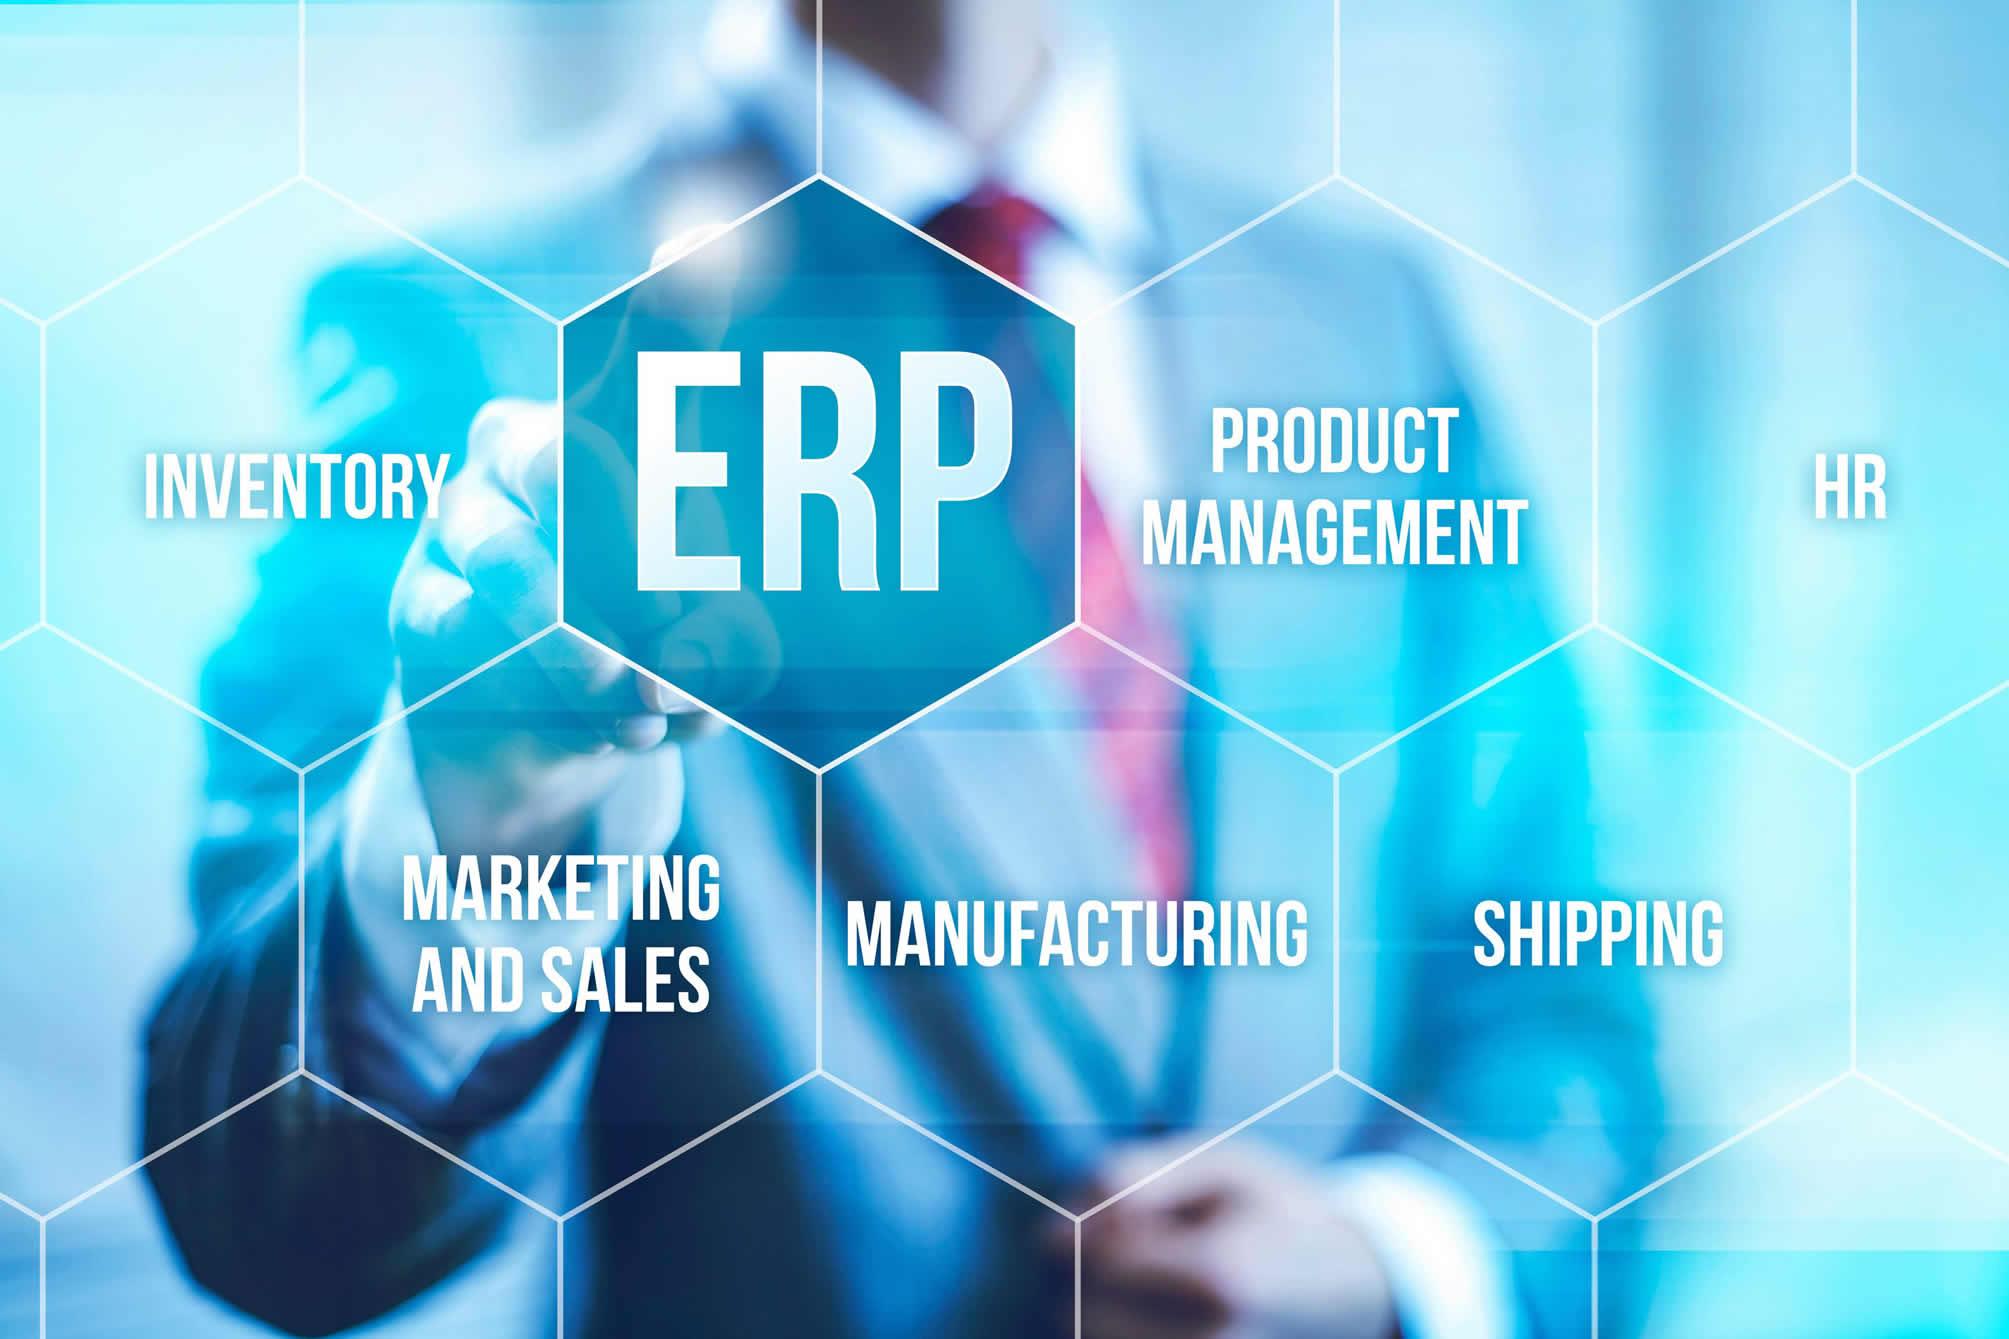 aventajar con un sistema ERP aventajar con un sistema erp ¿Cómo aventajar con un sistema ERP a tu competencia? software erp